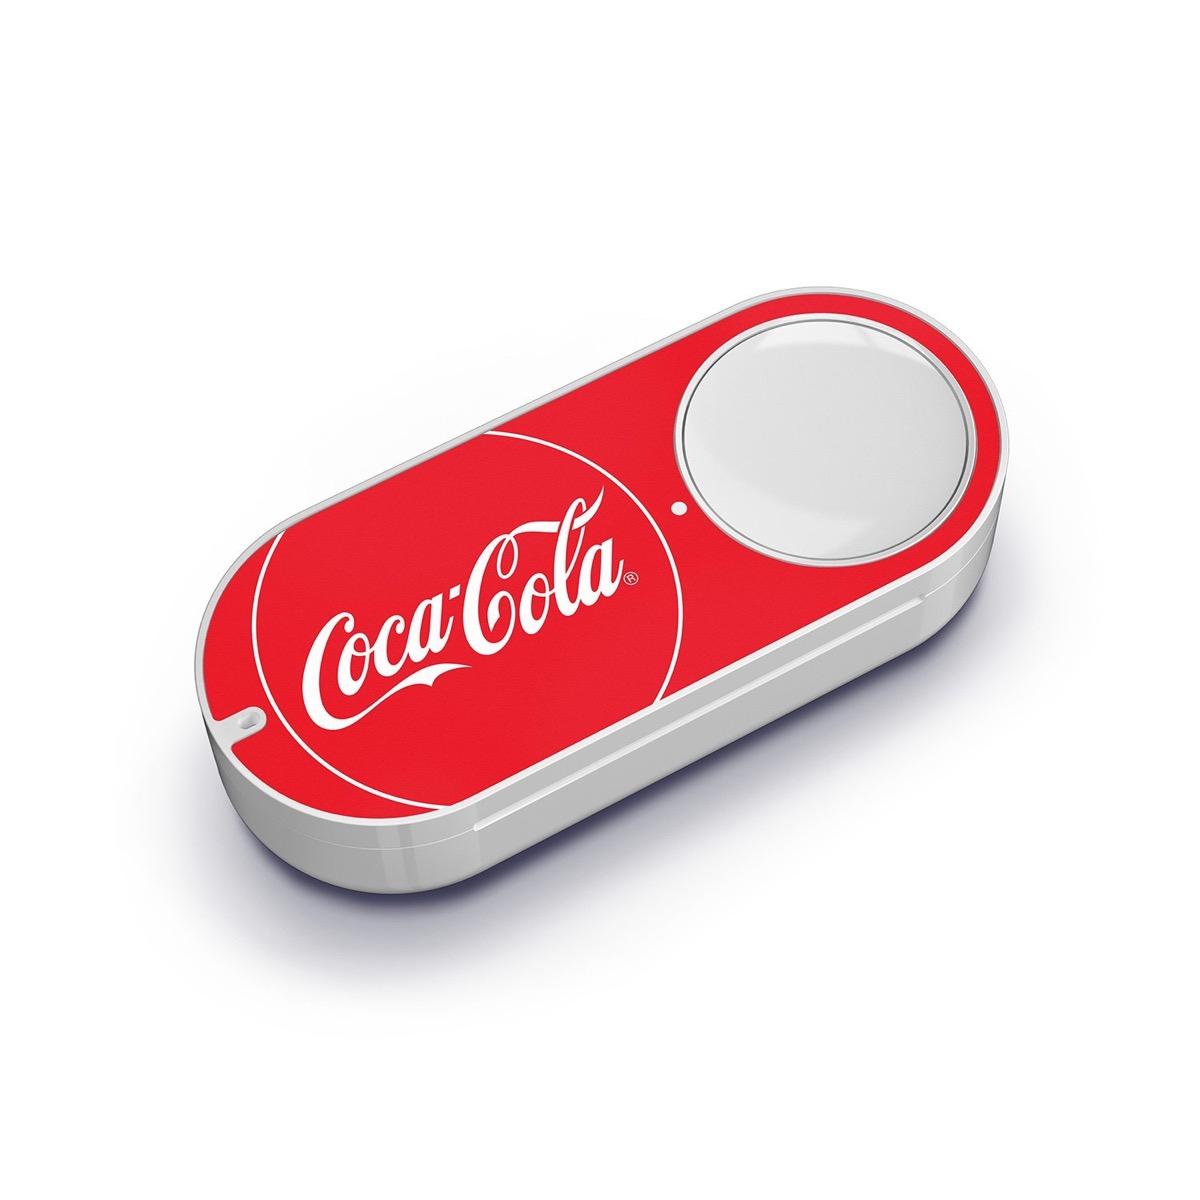 AmazonのDash-Buttonボタン